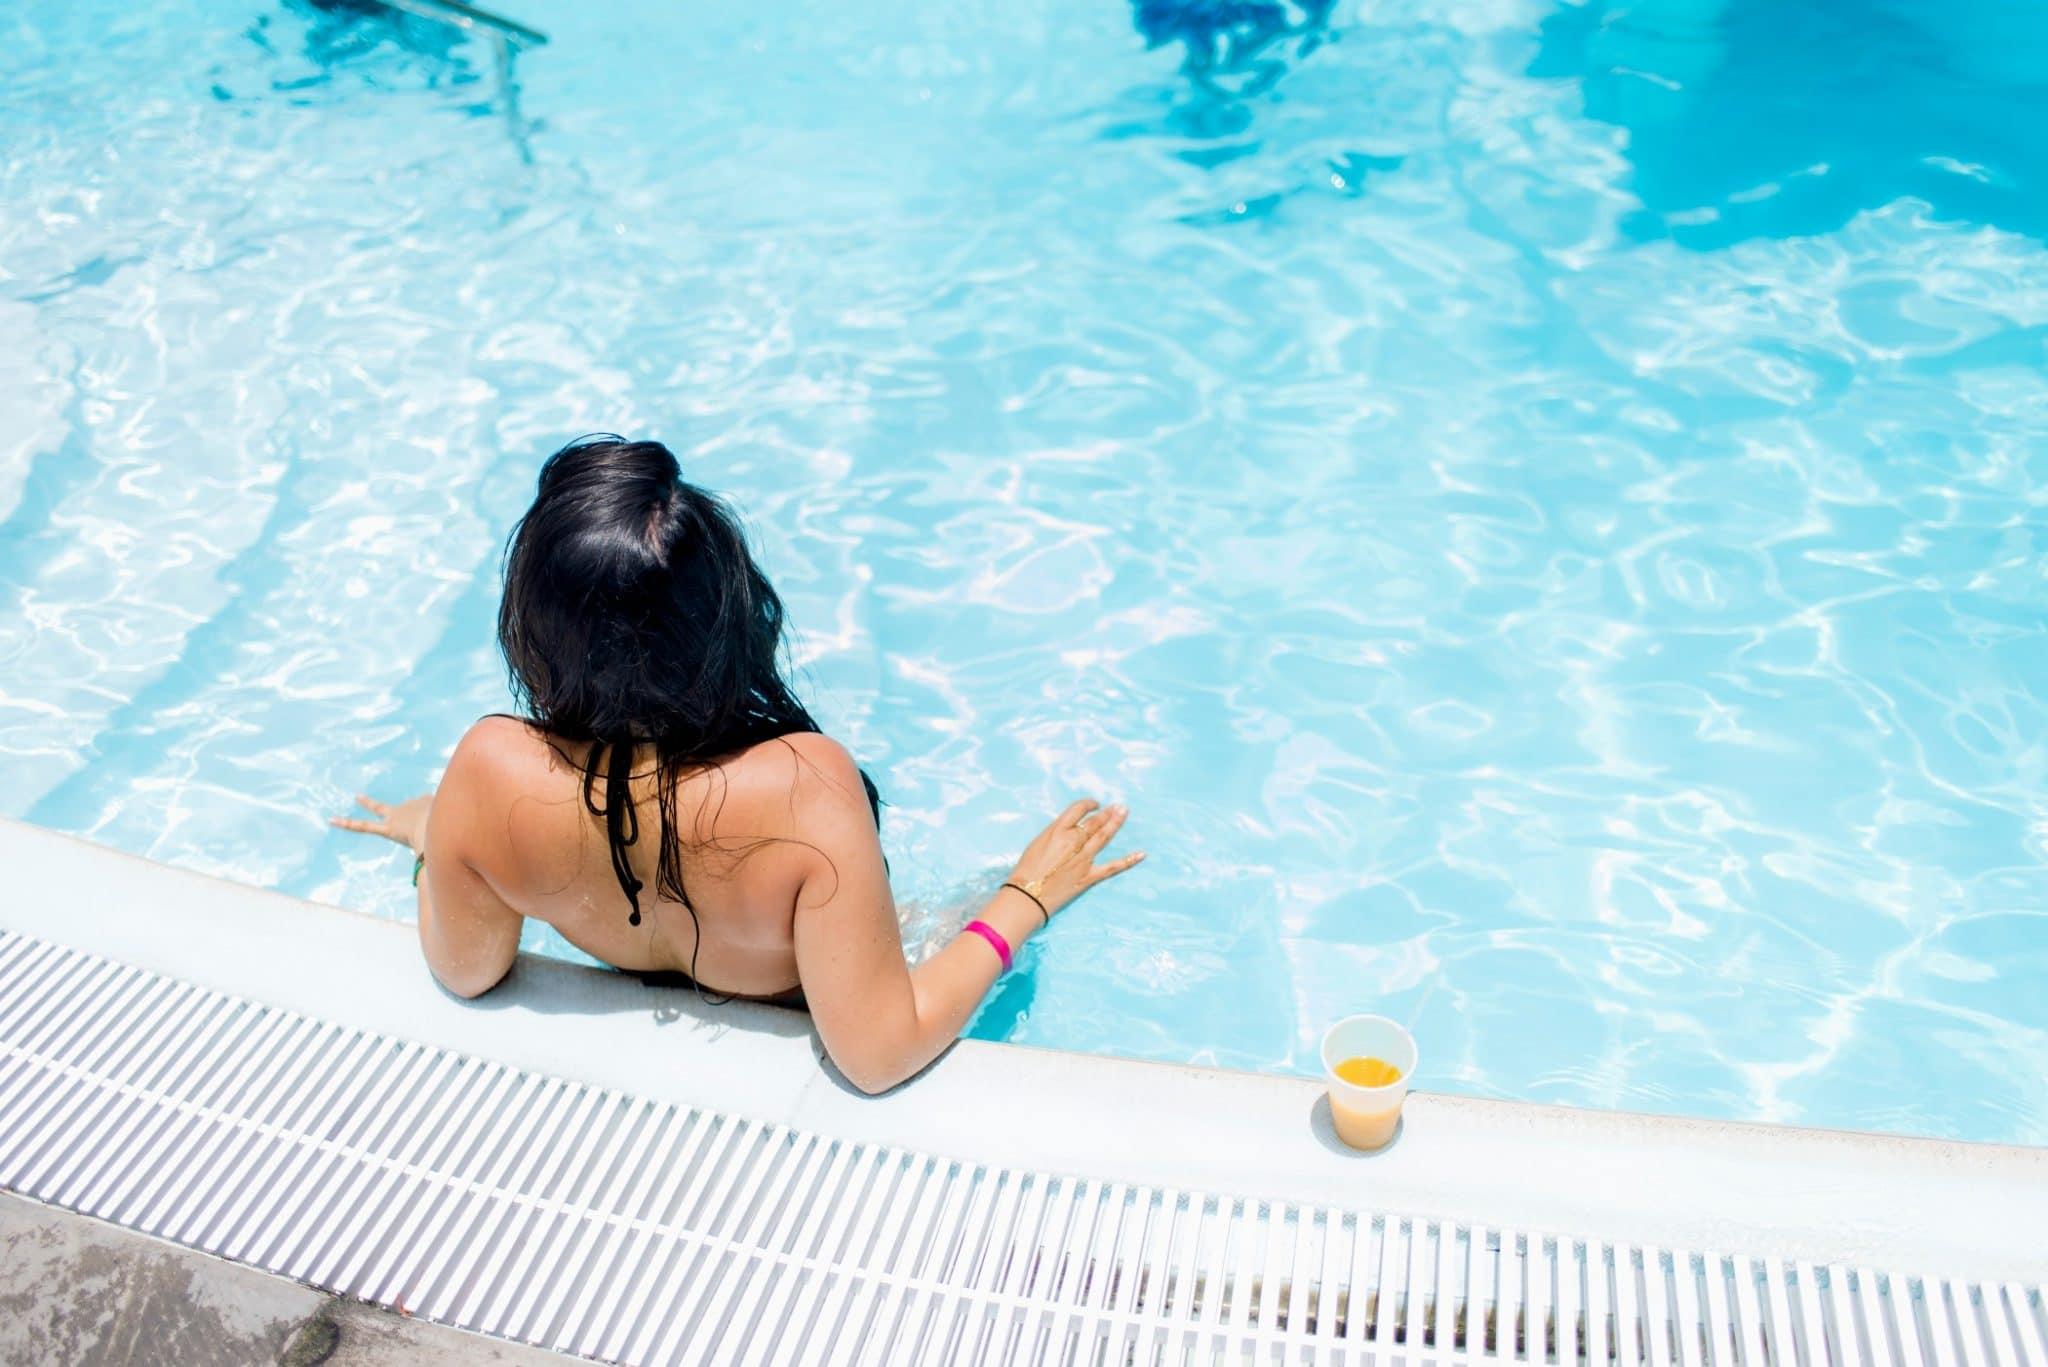 femme qui bronze au bord de la piscine